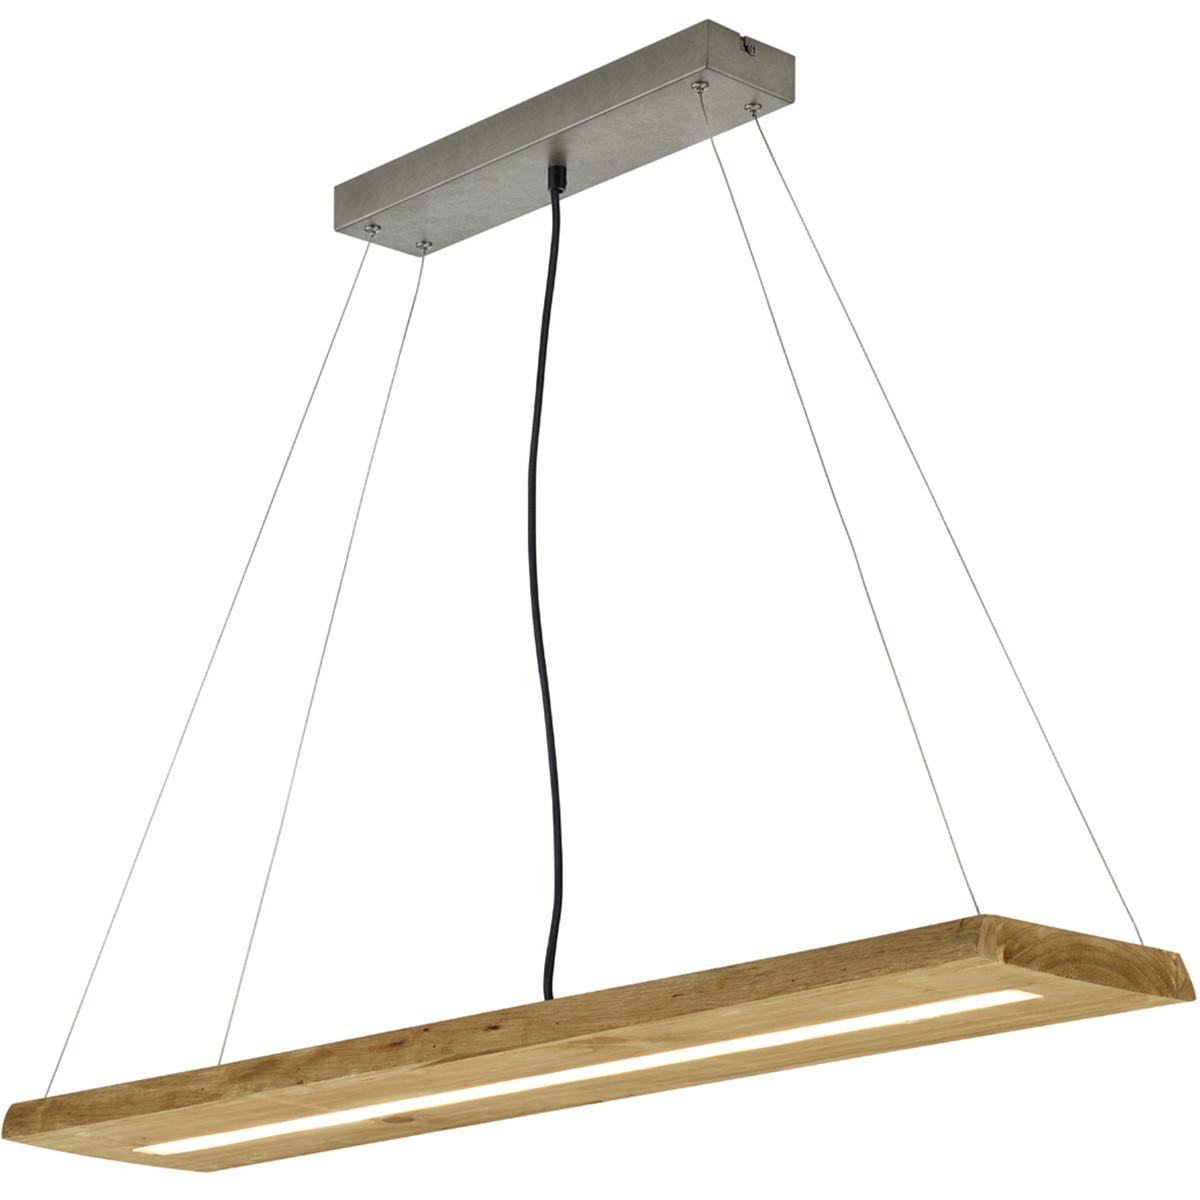 LED Hanglamp - Trion Brida - 27W - Warm Wit 3000K - 1-lichts - Dimbaar - Rechthoek - Mat Bruin - Nat